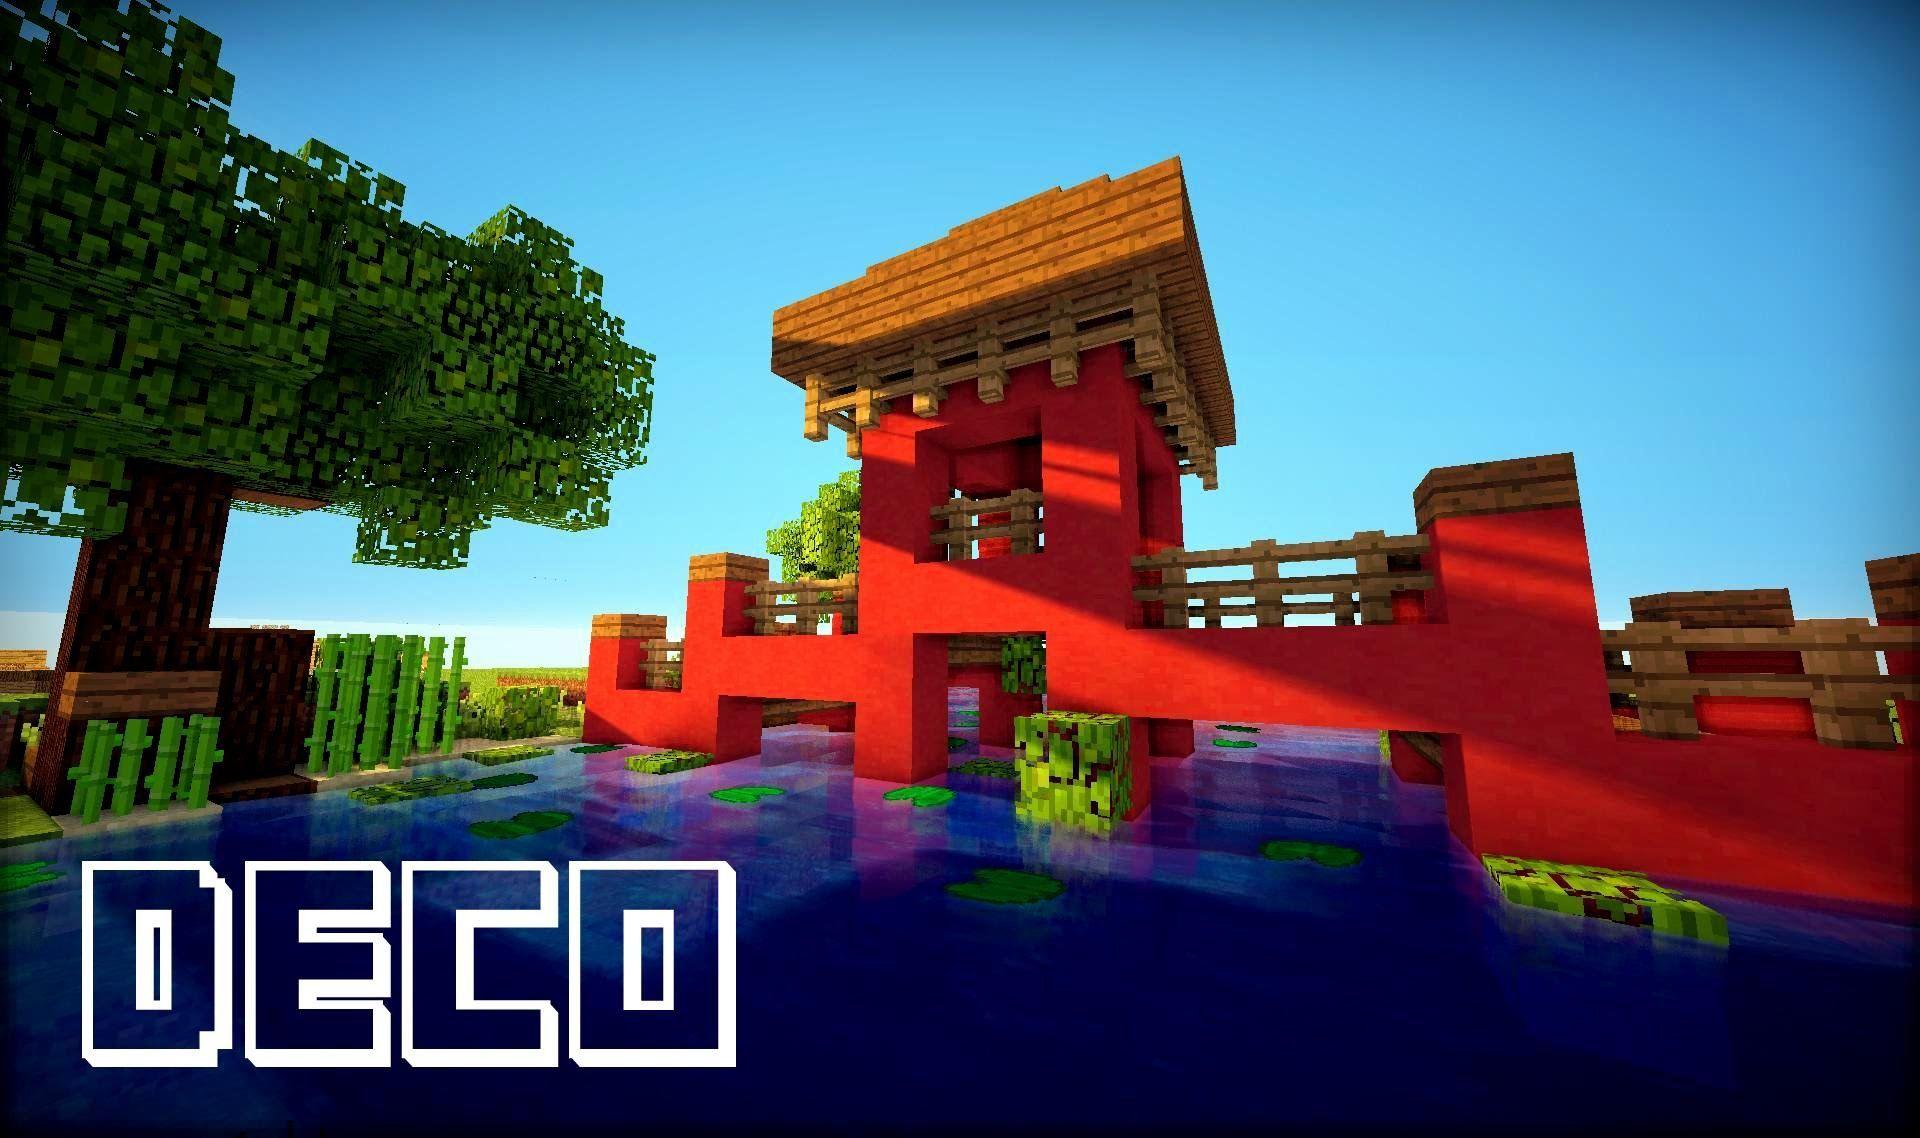 Minecraft Creer Un Pont Asiatique Minecraft Pont Asiatique